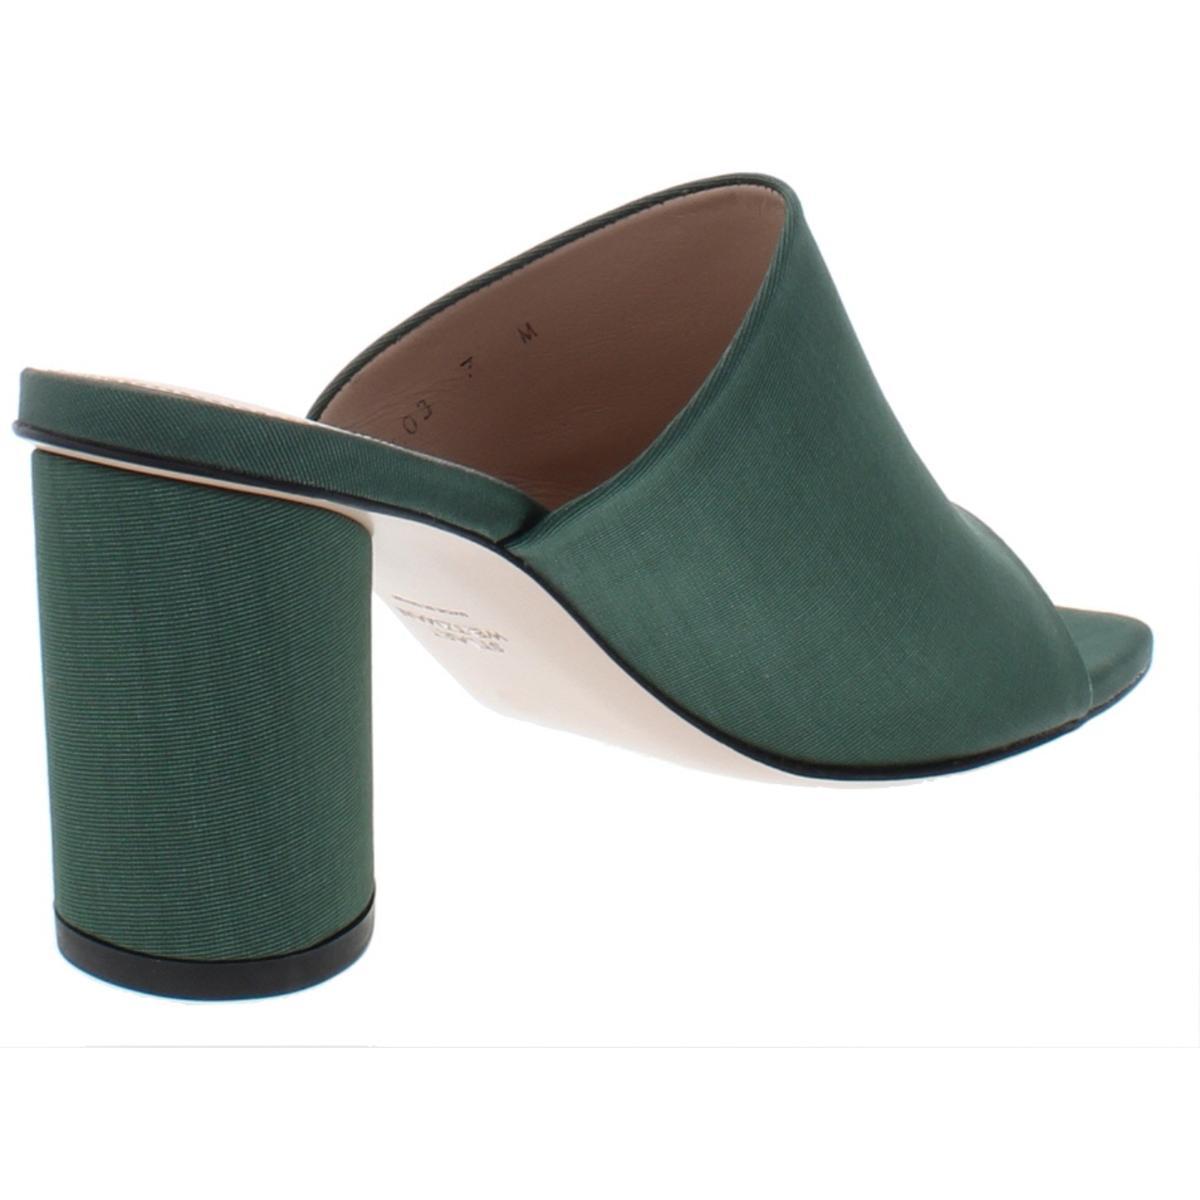 Stuart-Weitzman-Womens-Slide-On-Jacquard-Slide-Sandals-Heels-BHFO-5173 thumbnail 4